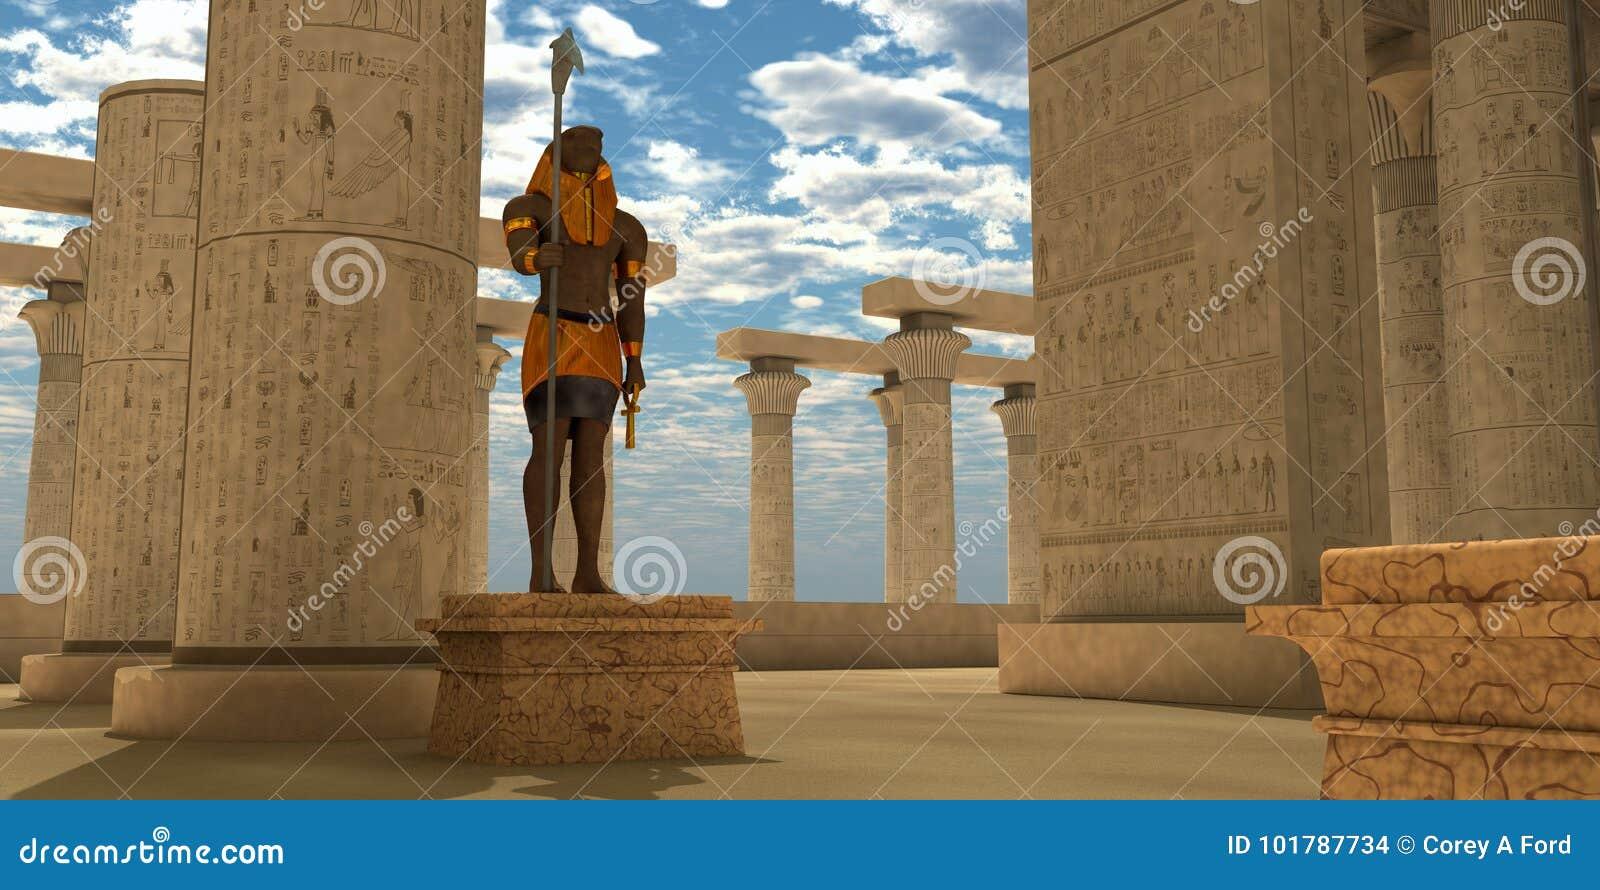 Egyptian Statue of Horus